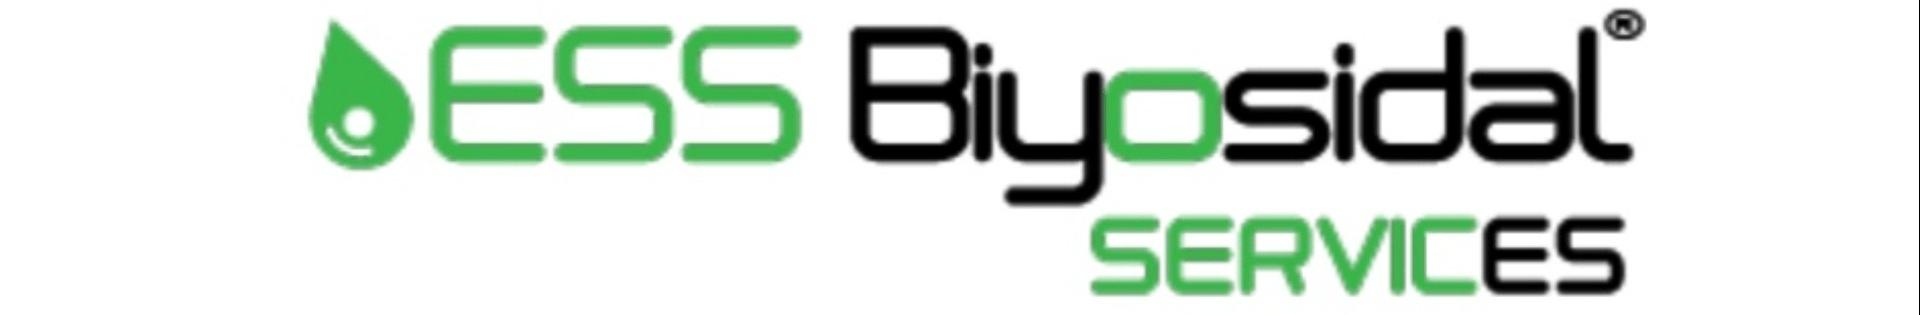 ESS Biyosidal Services